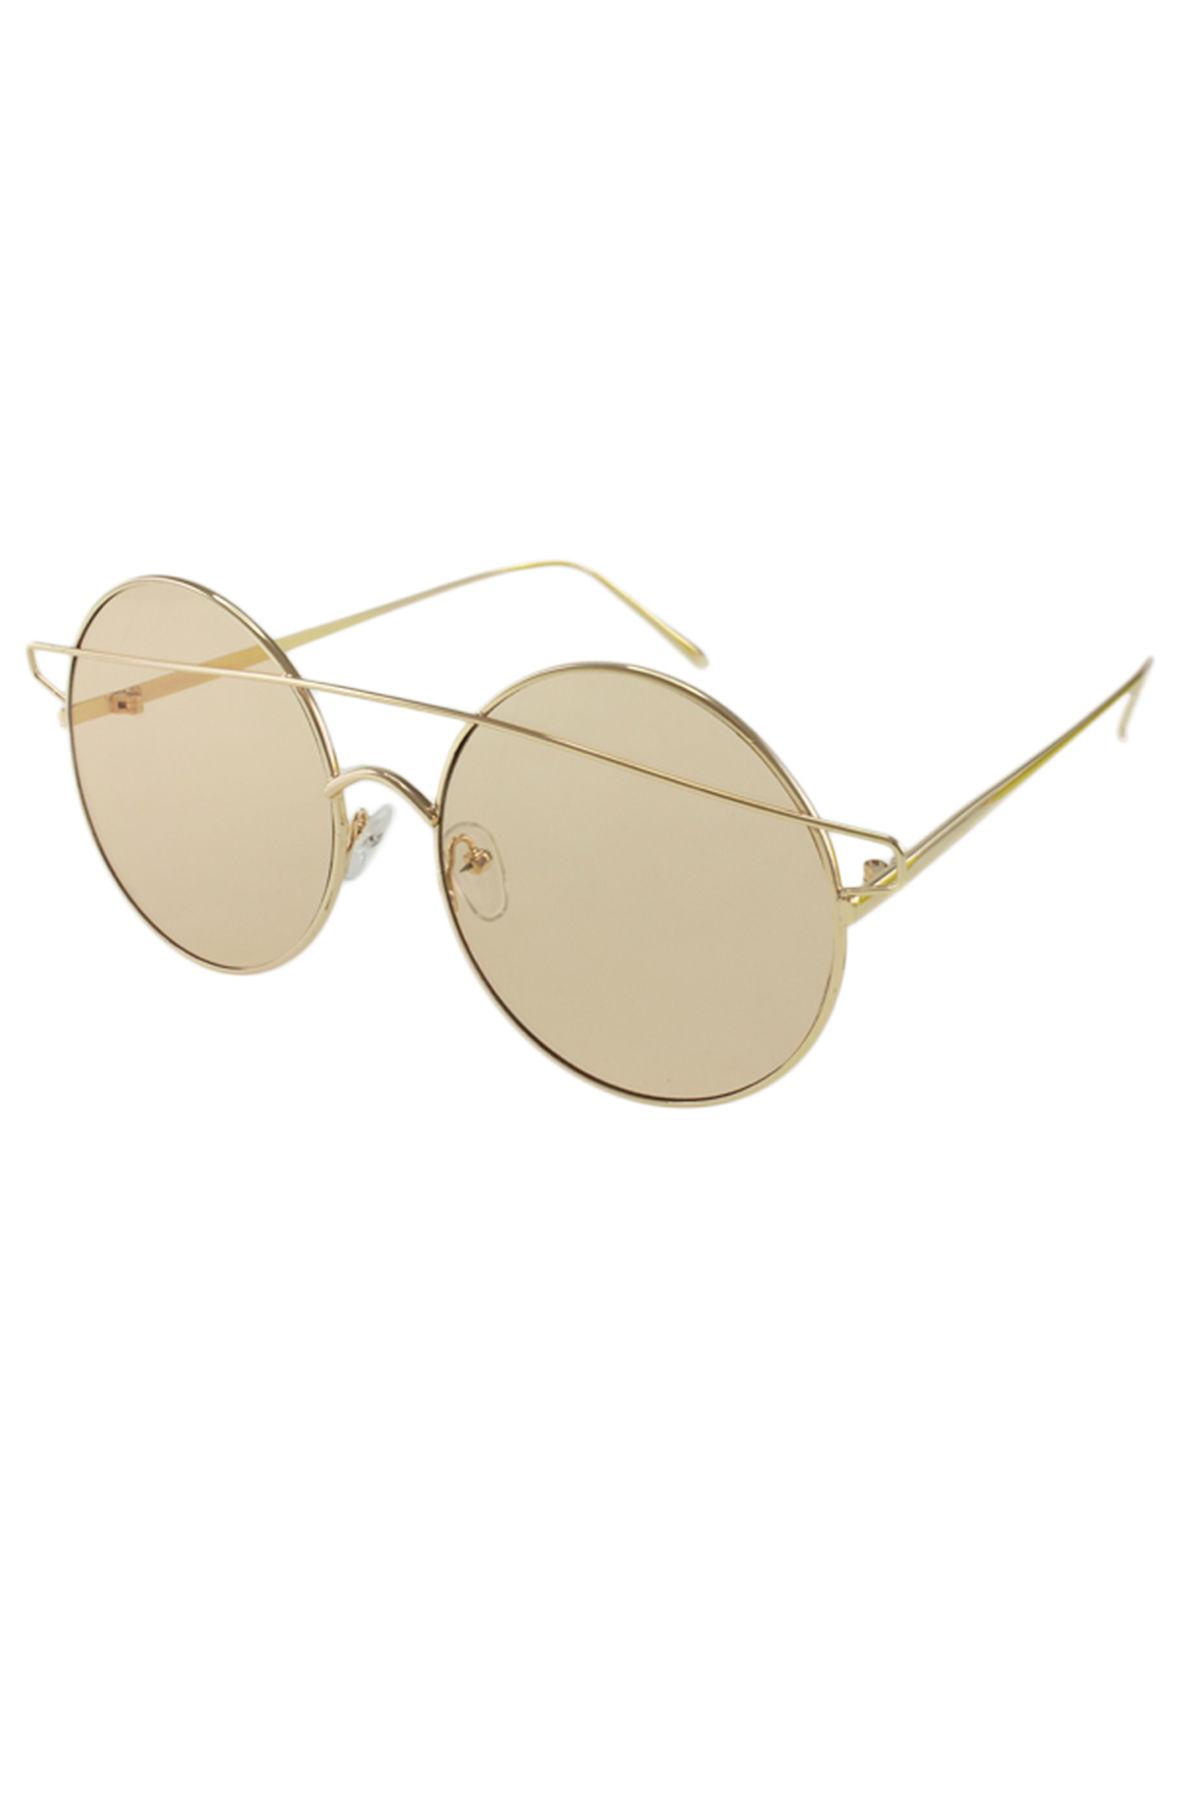 The Meridian Sunglasses in Tan